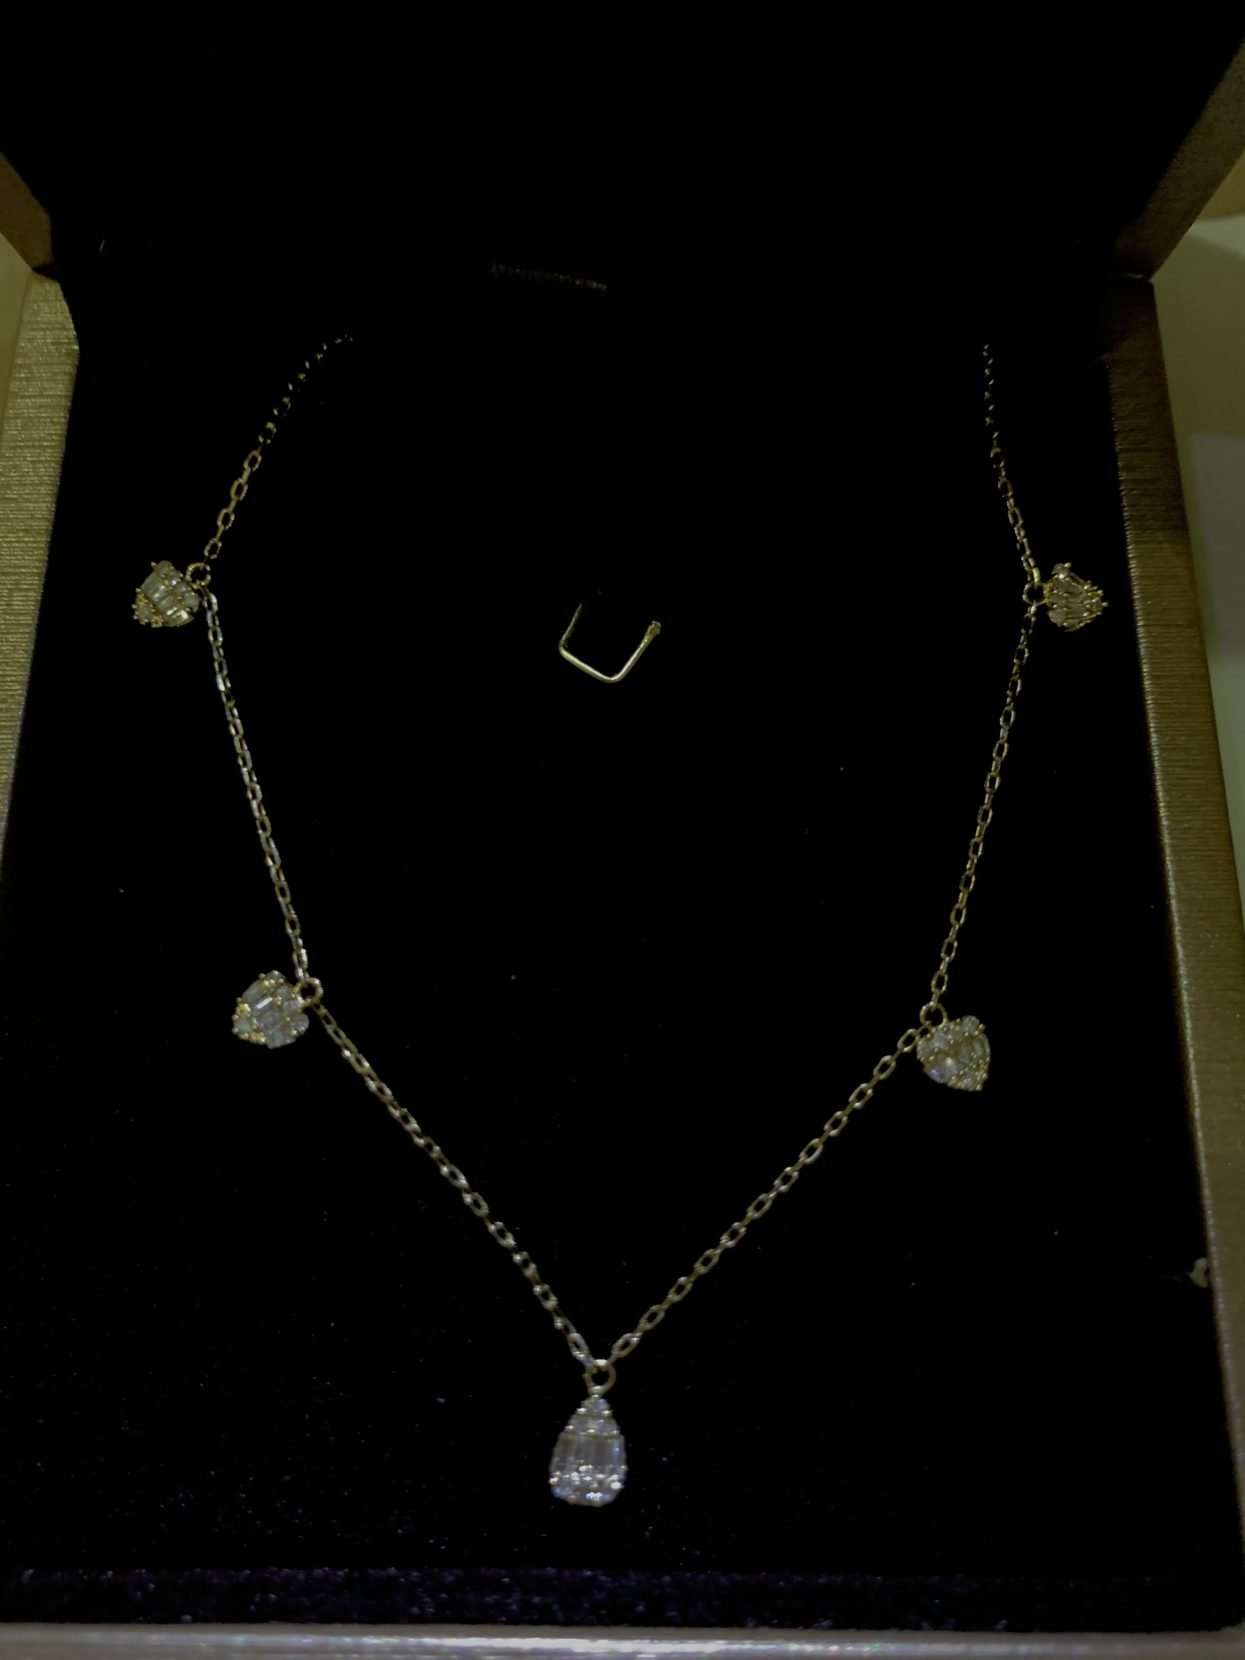 Diamond station necklace for sale